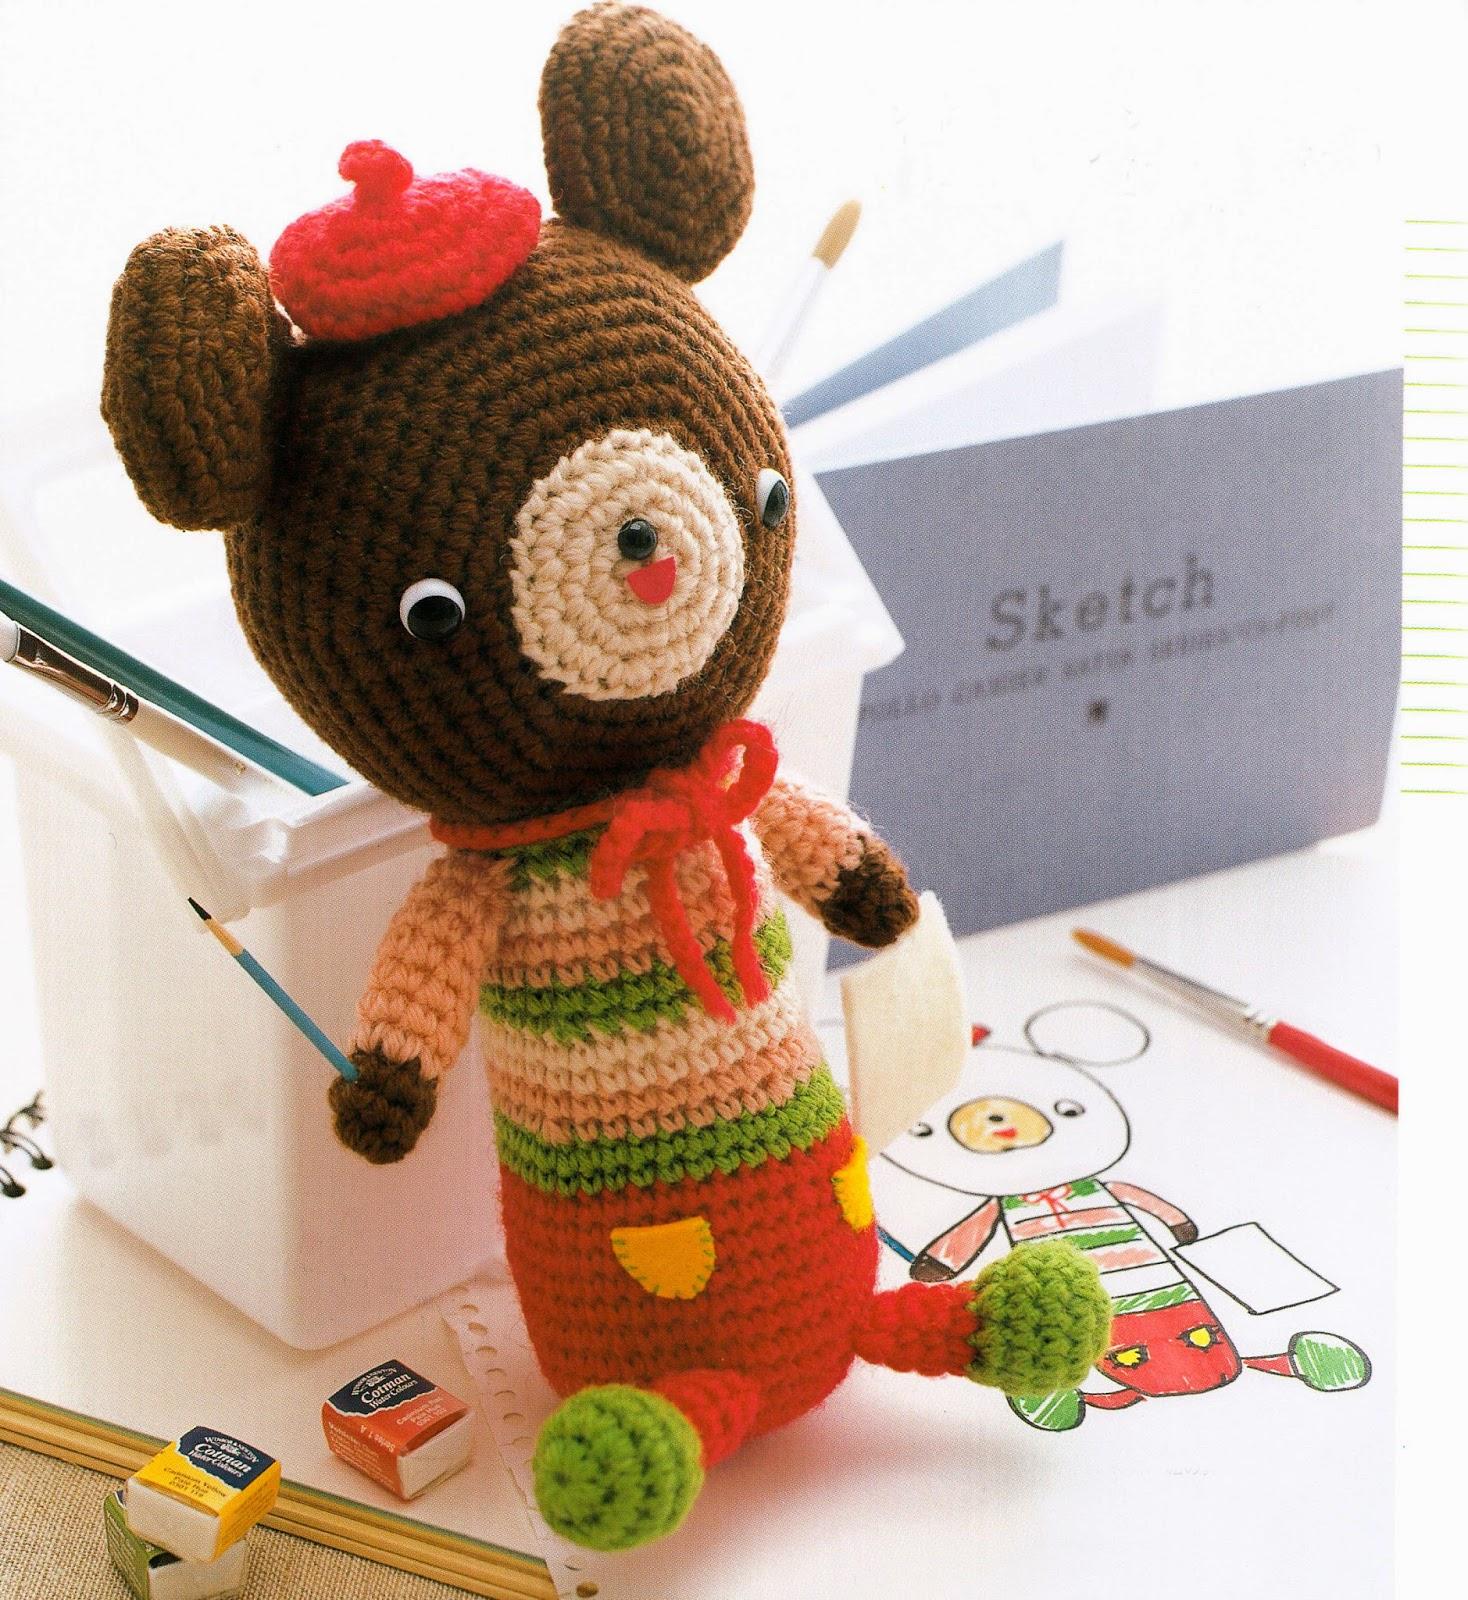 JAPANESE CROCHET AMIGURUMI PatternAmigurumi Crochet Mascot | Etsy | 1600x1468